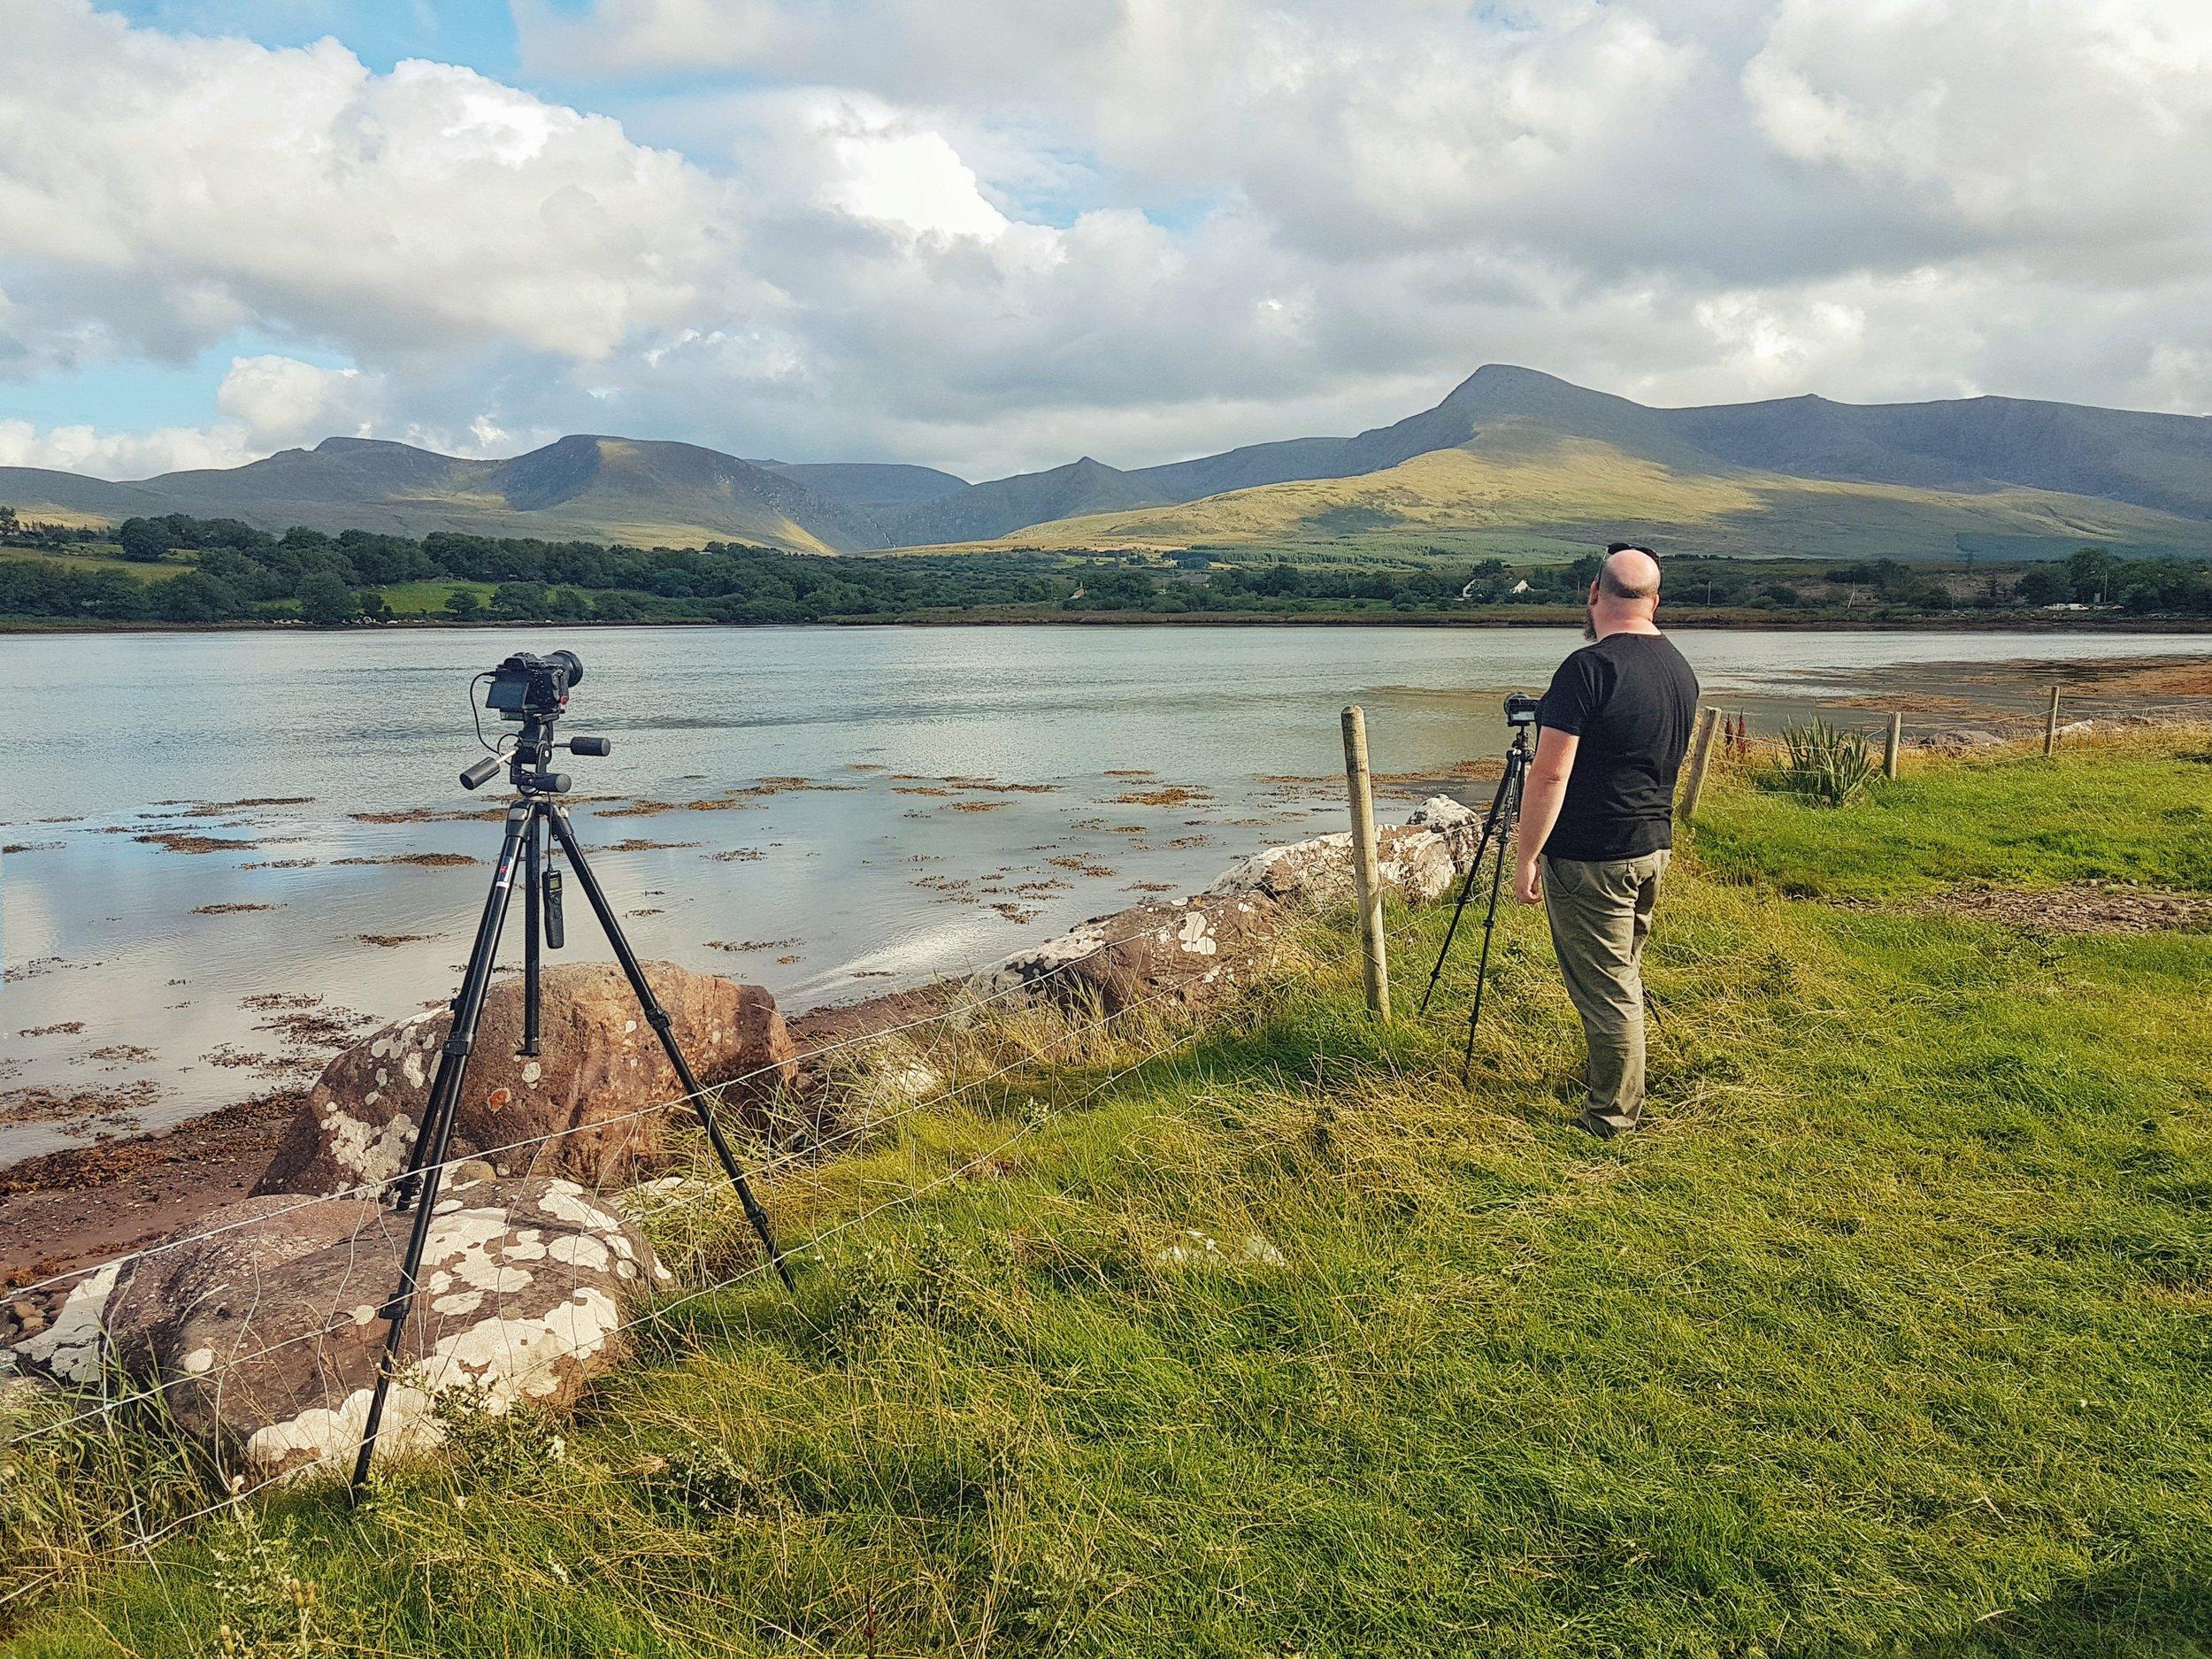 Ireland. Wild Atlantic Way. Kerry. Counthy Kerry. Travel photography. Landscape photography. Blog. Irish. Travelling Ireland. Ireland west coast. Wild Landscape. Trip. Vacation.  (5).jpg